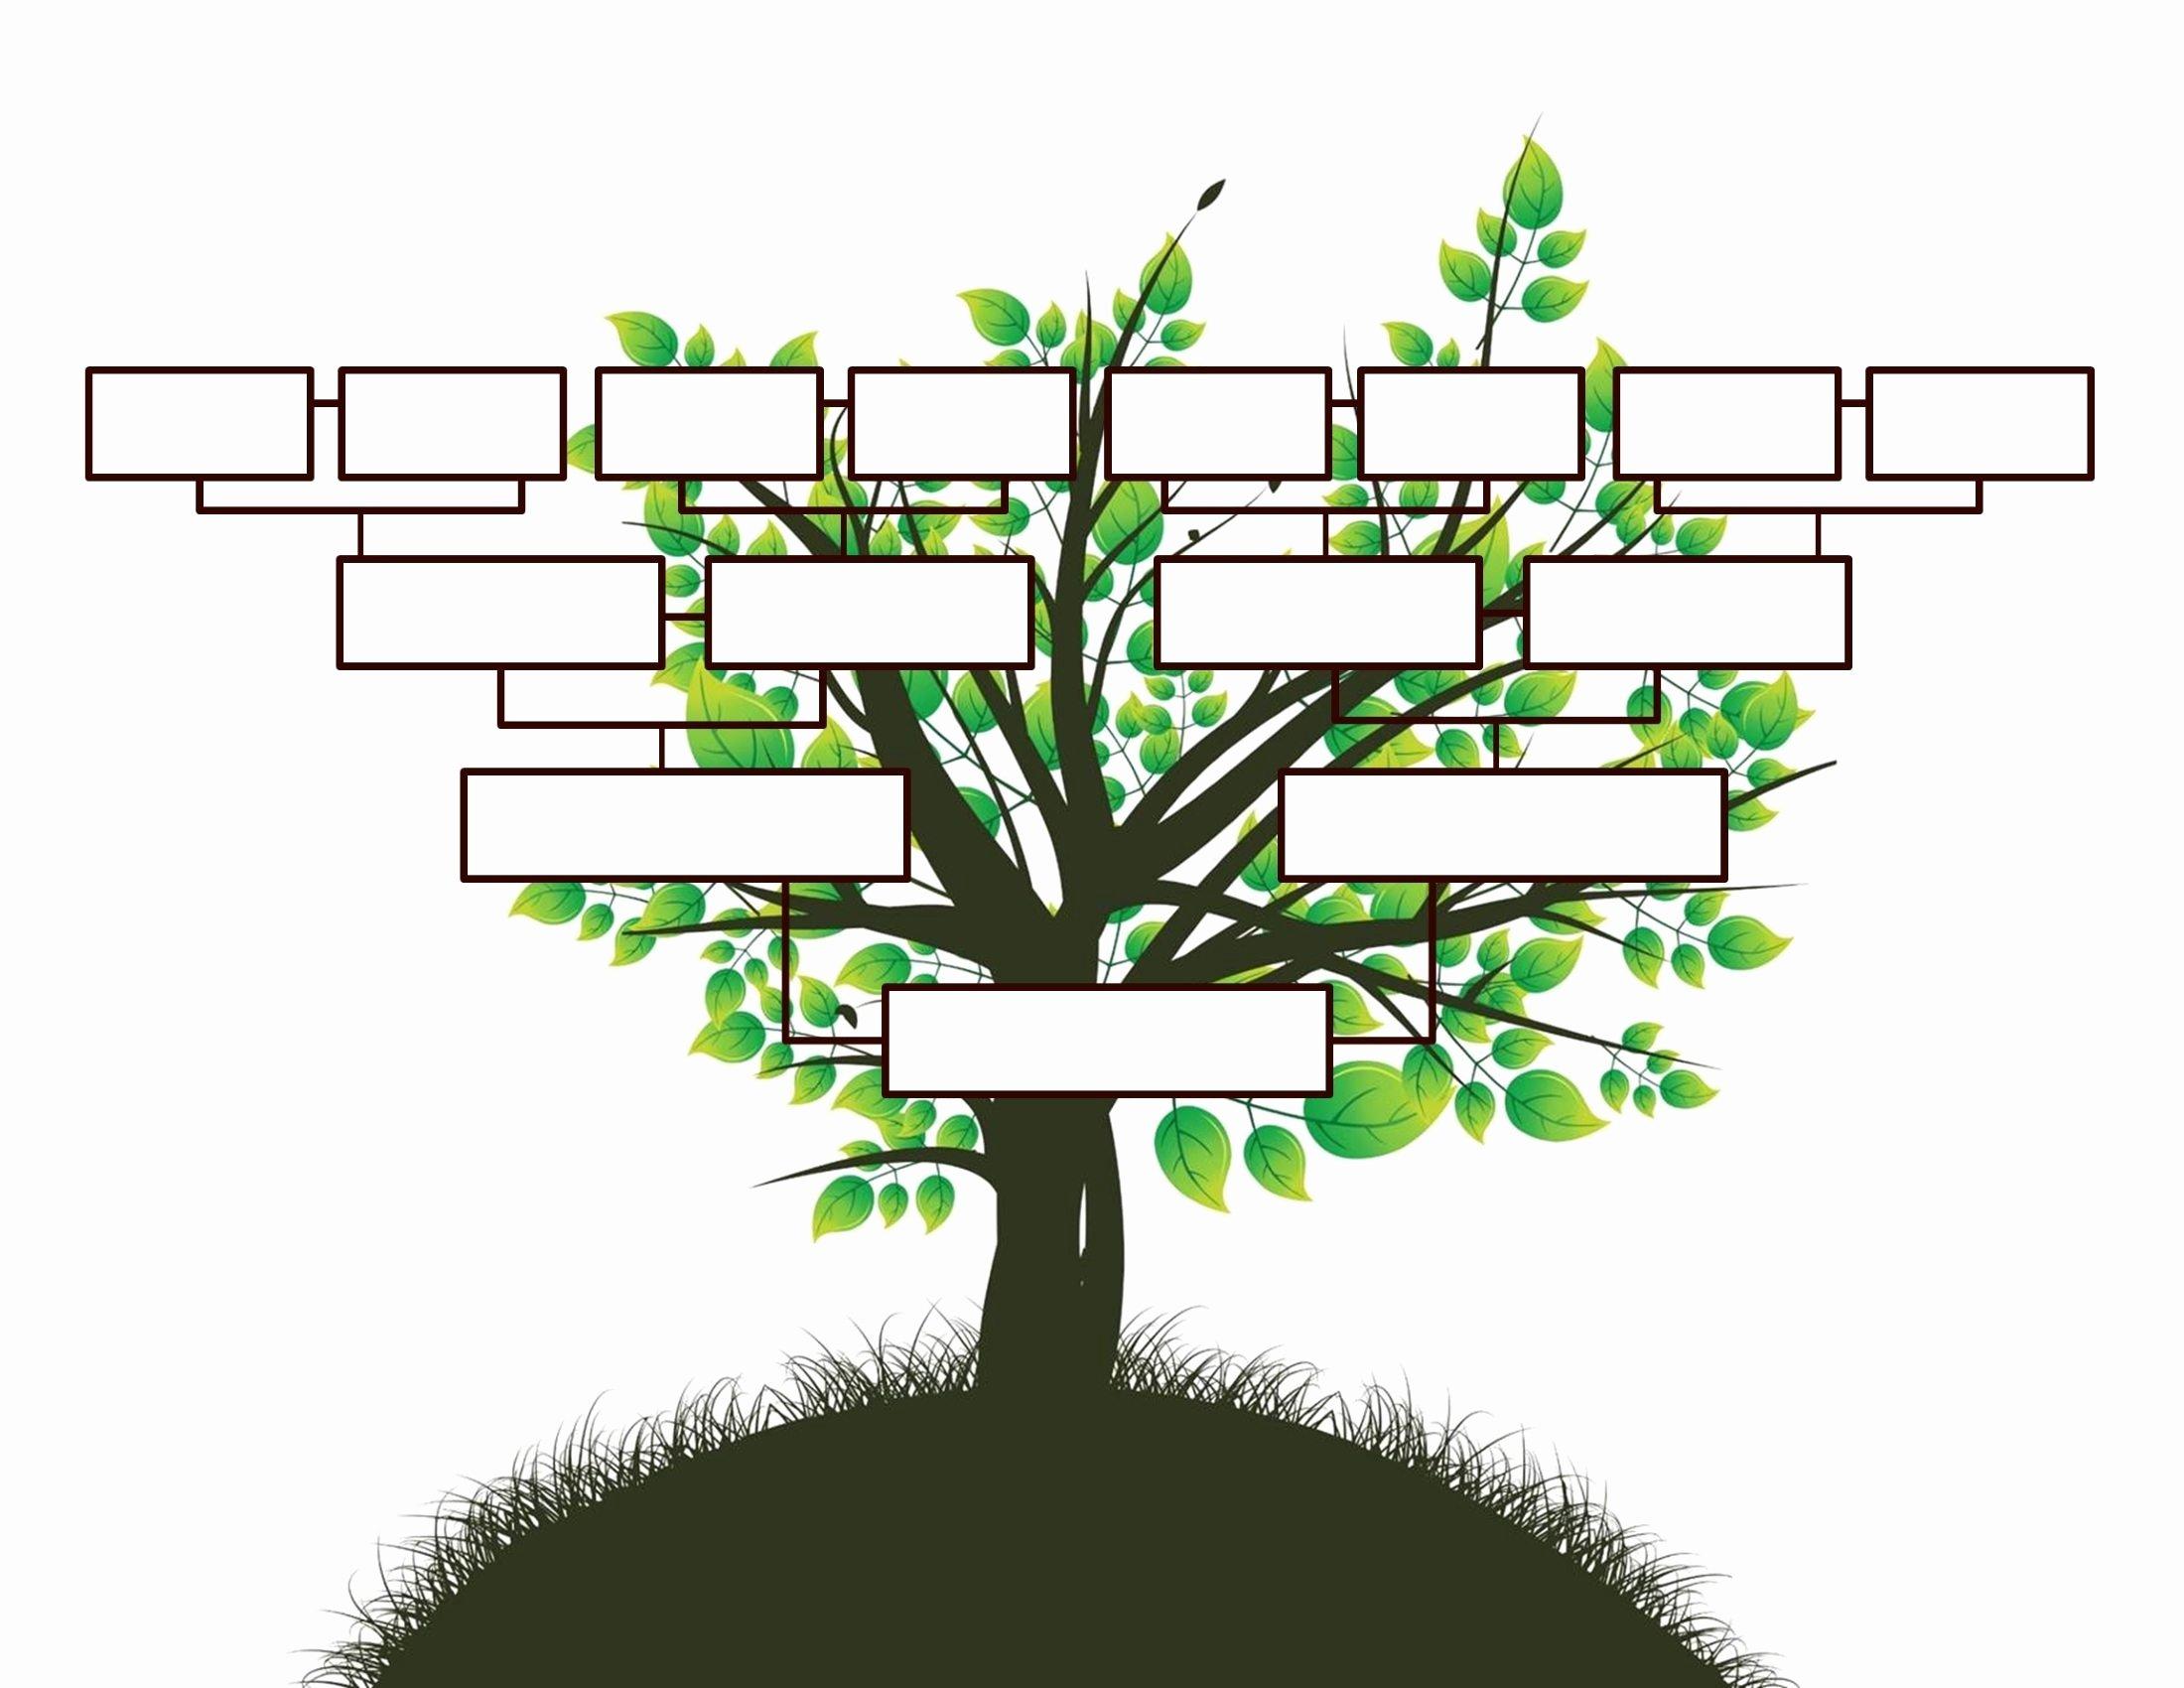 Family Health Tree Template Lovely Free Editable Family Tree Template Daily Roabox